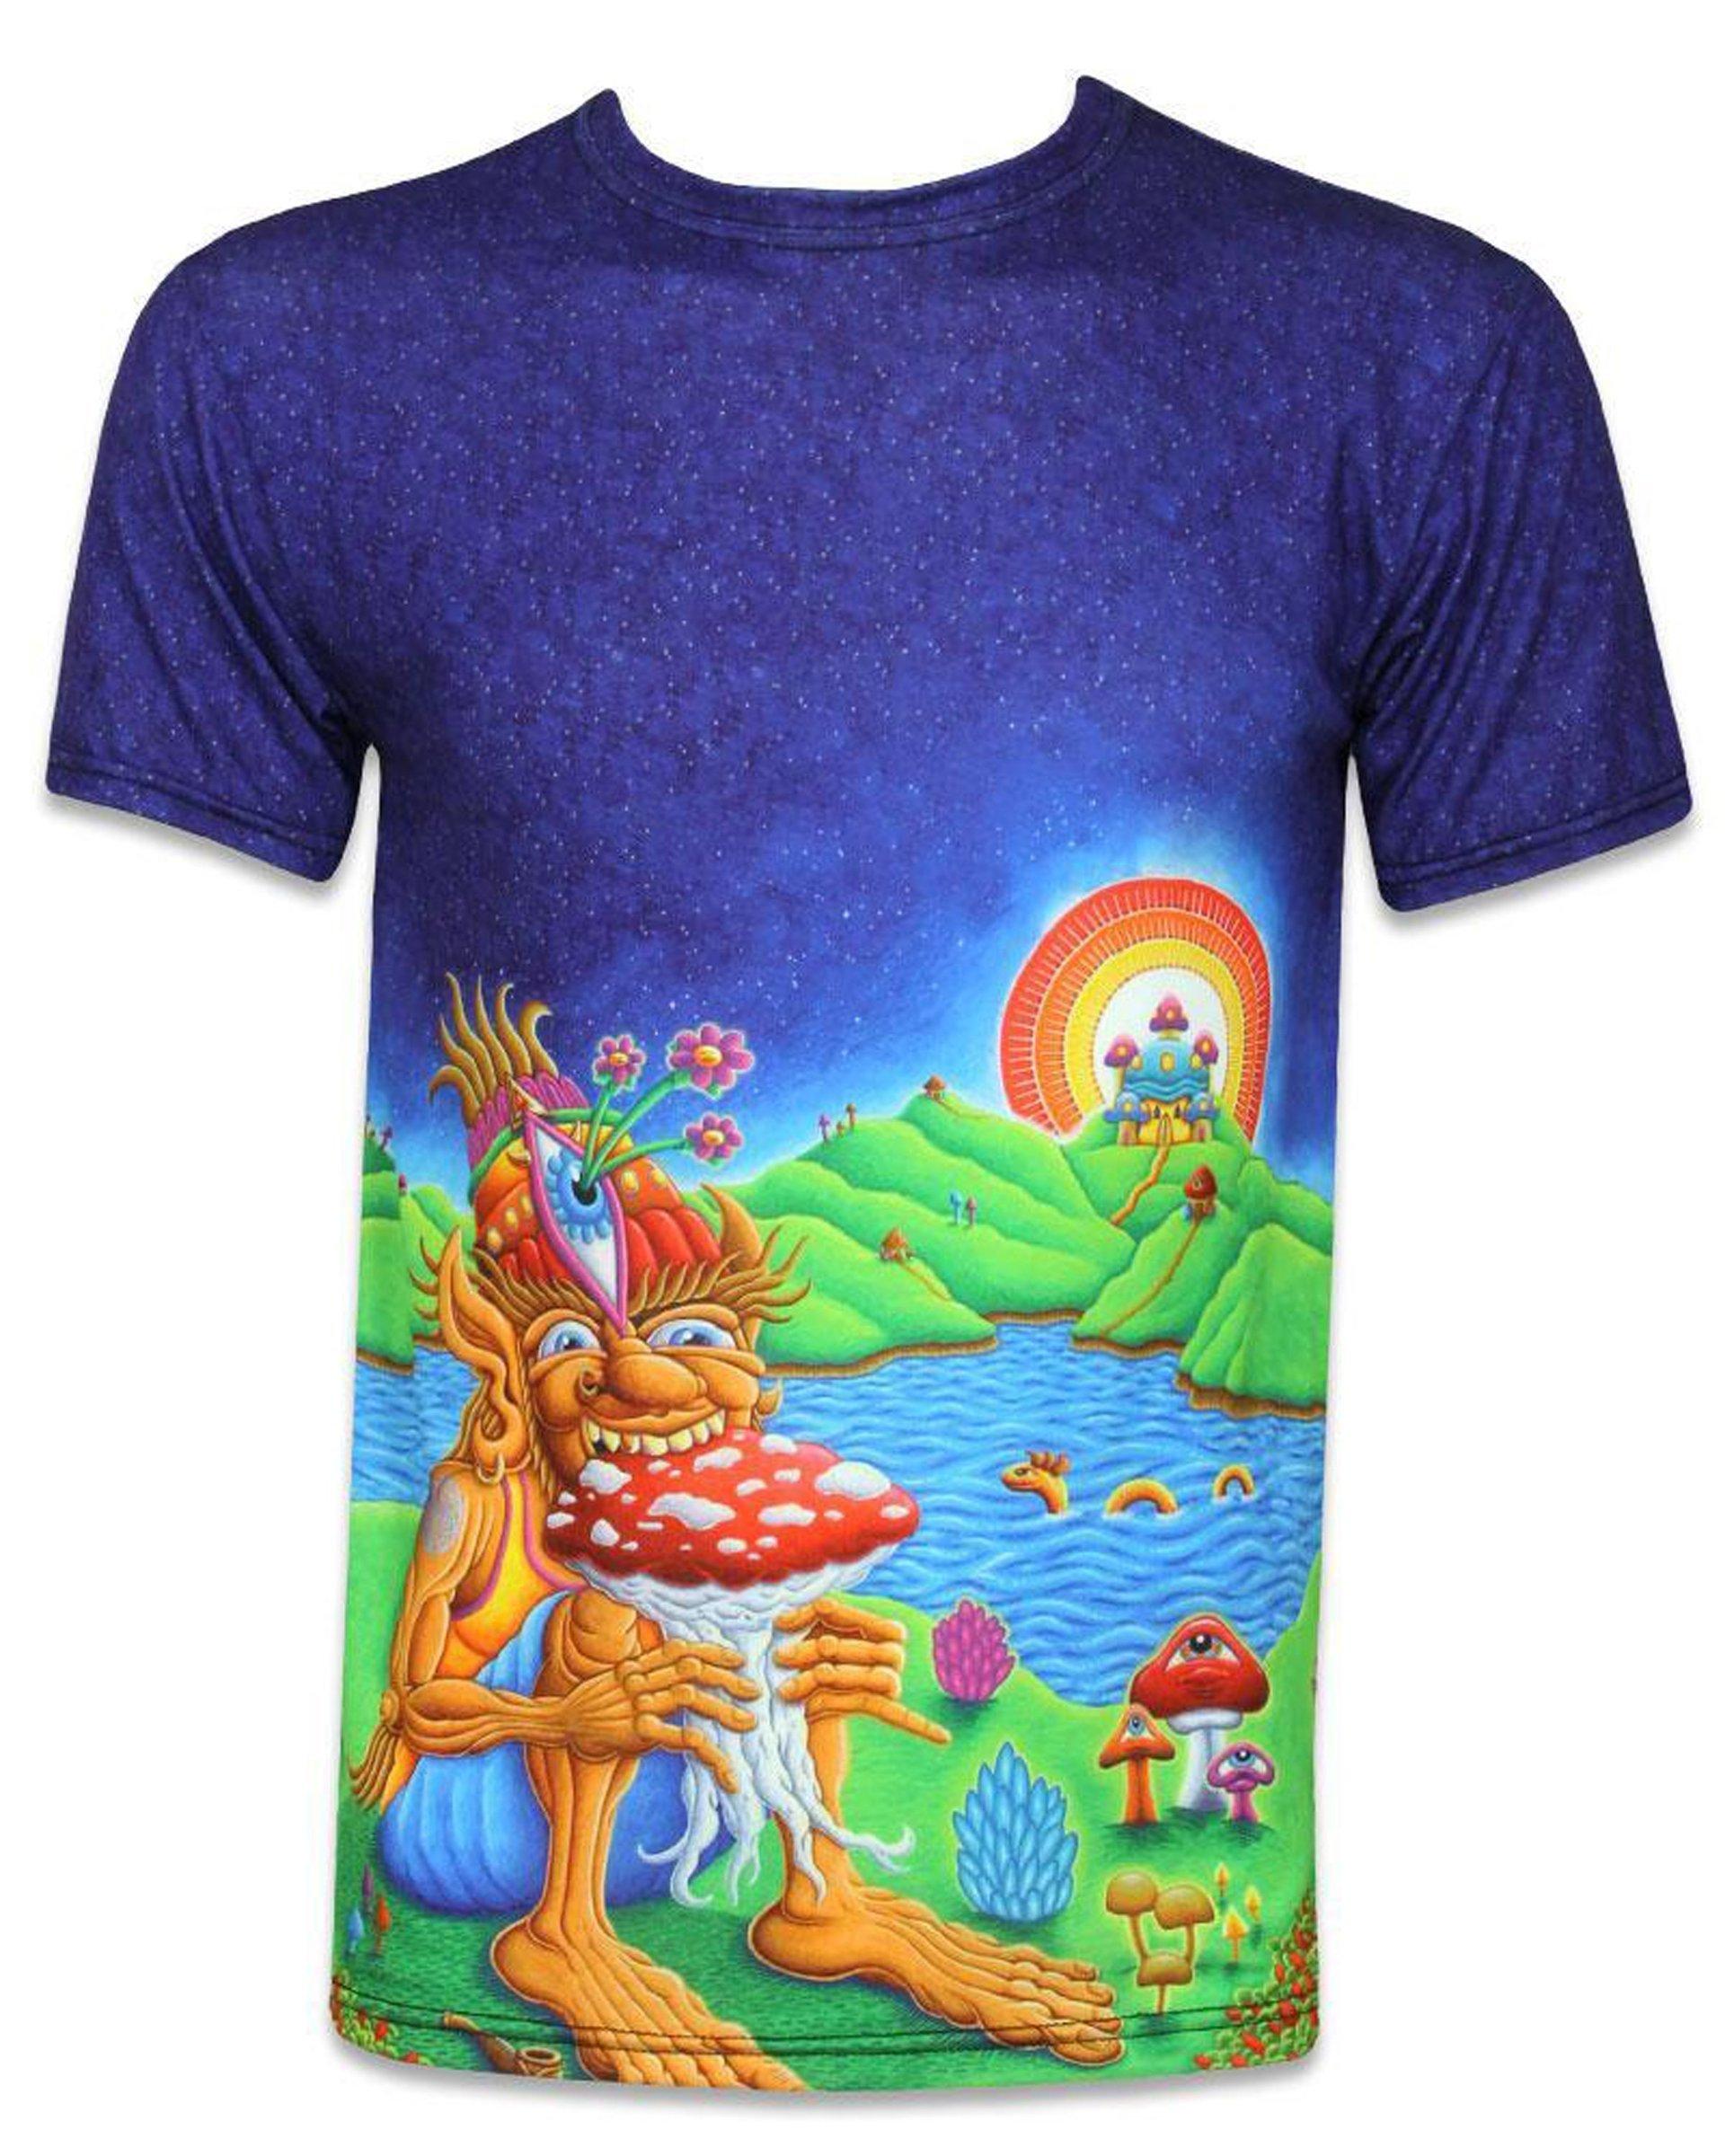 Chris Dyer Muncher of Mushroomland Short Sleeve Men's T-Shirt (Front)